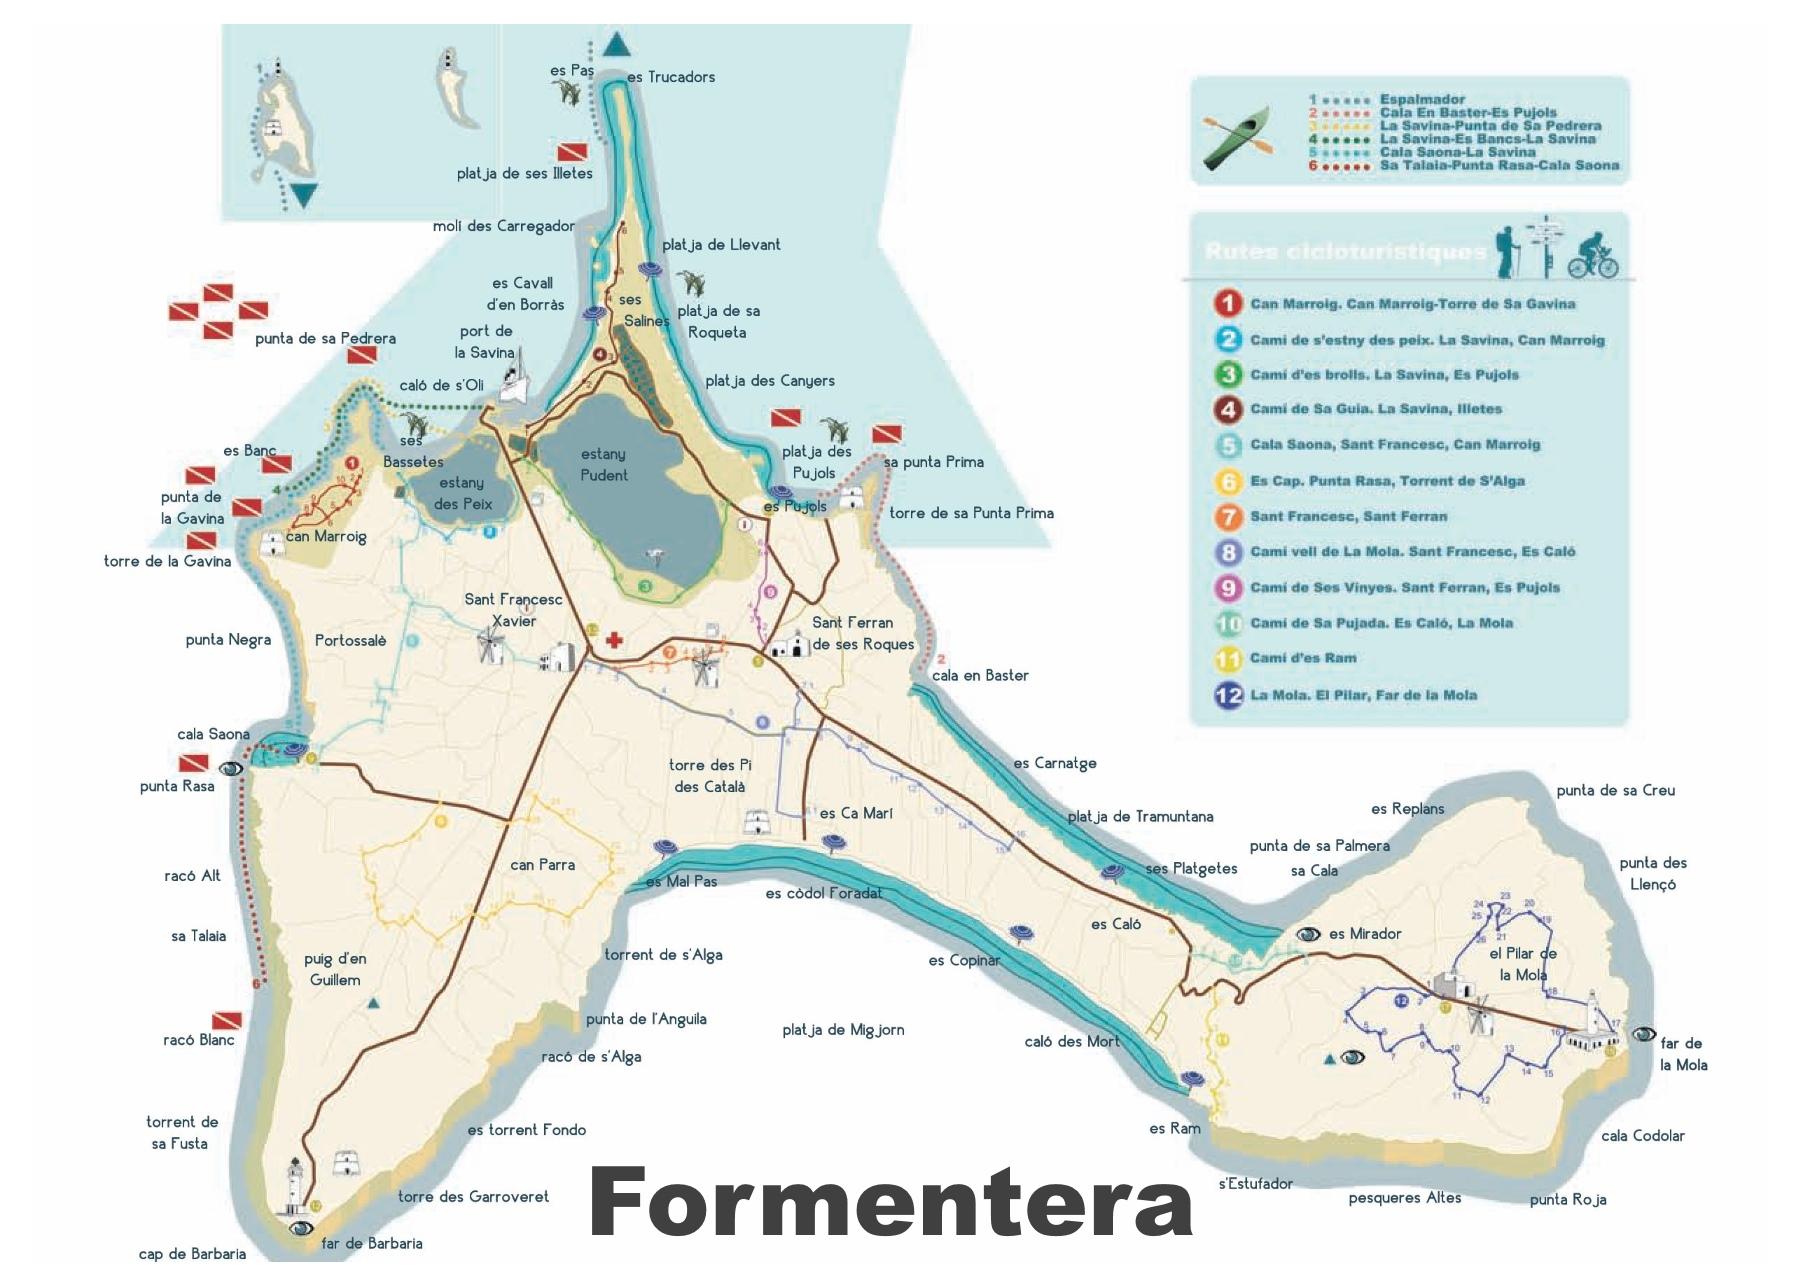 Formentera travel map